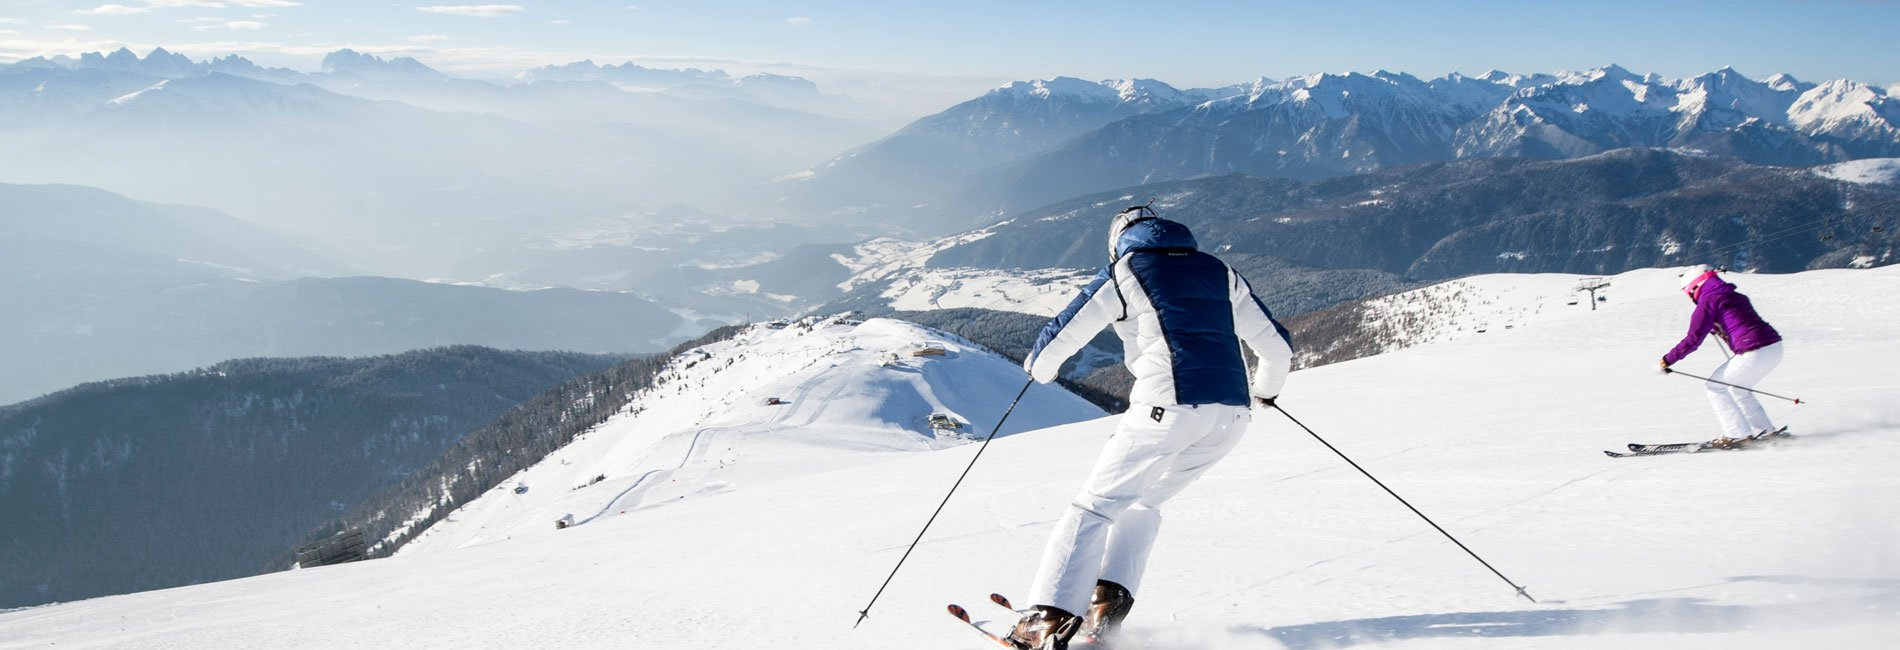 skiurlaub-meransen-02